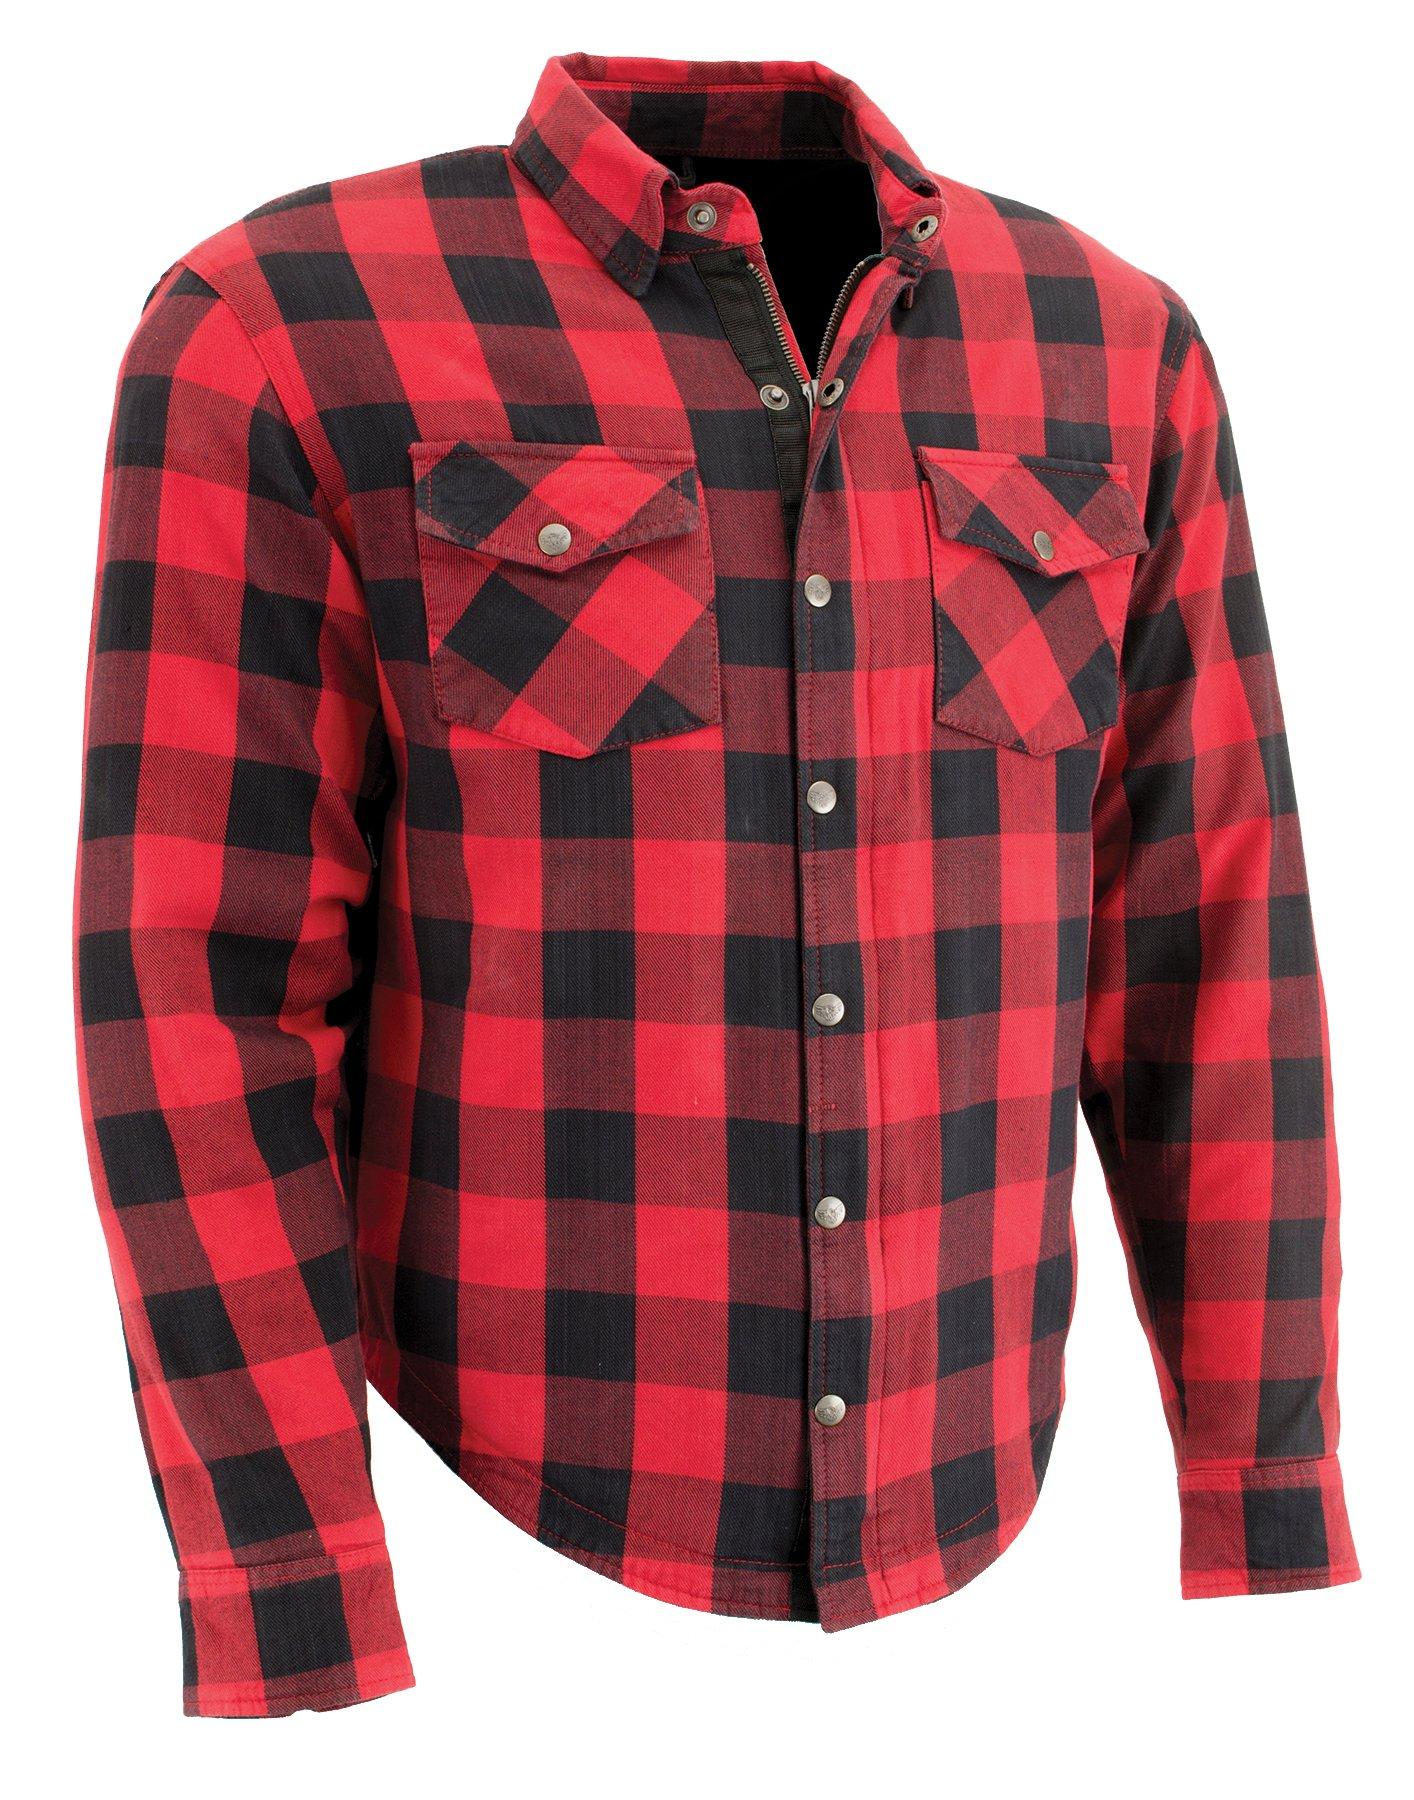 Milwaukee Performance Men's Checkered Flannel Biker Shirt With Aramid (Black/Red, 4X) by Milwaukee Performance